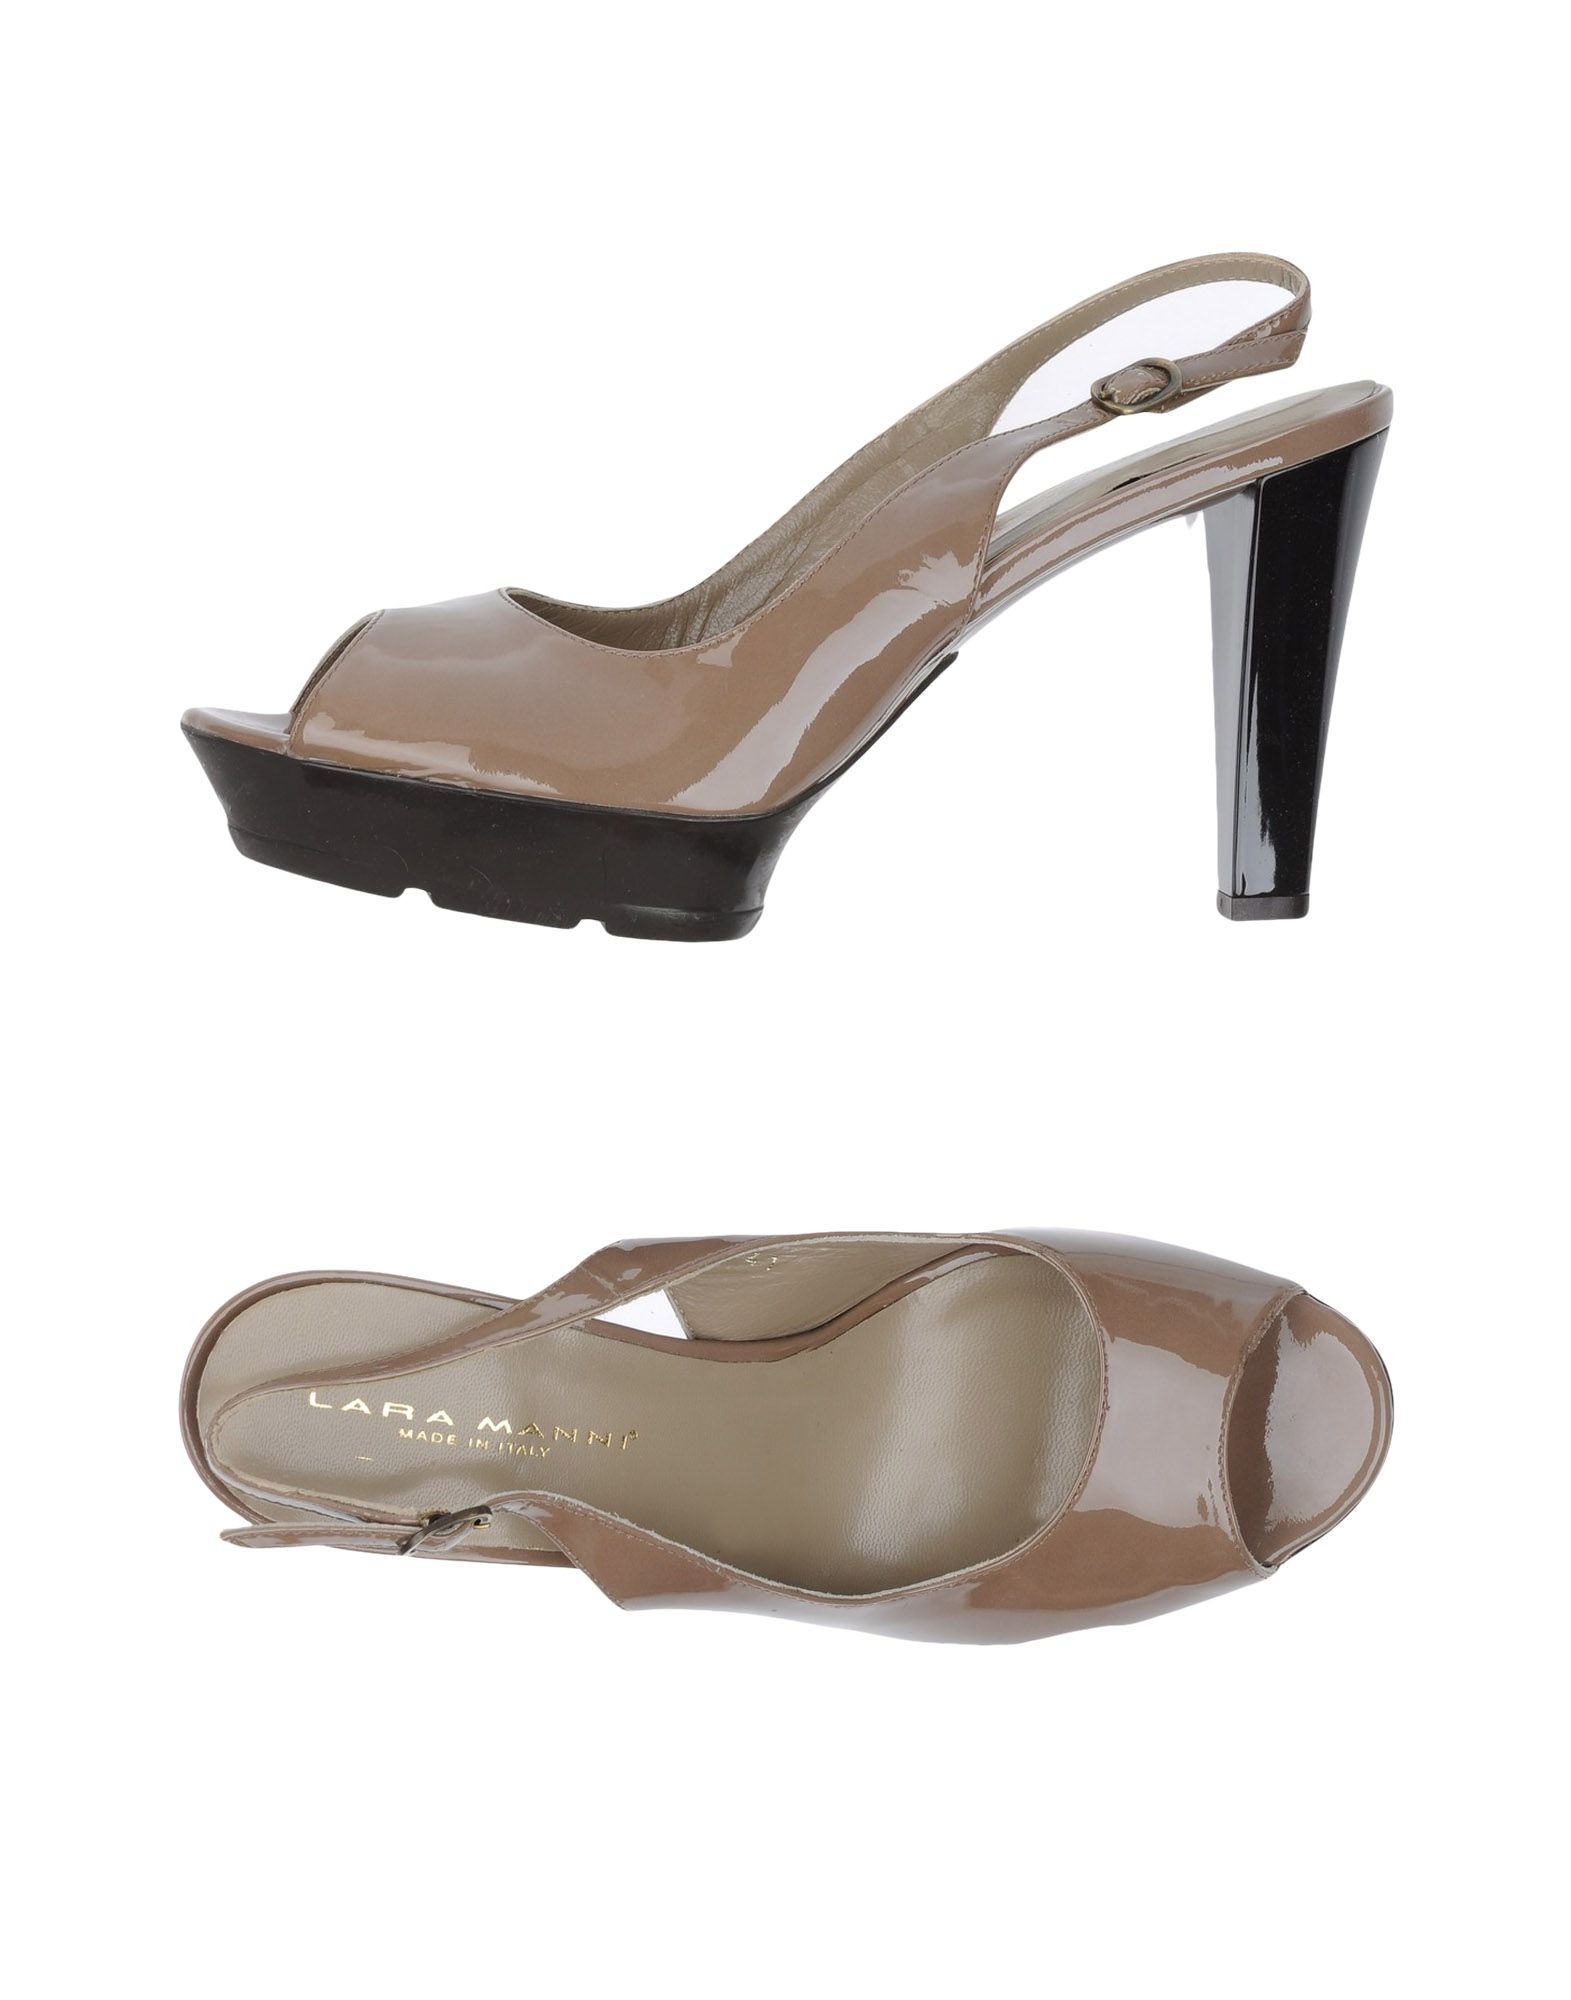 LARA MANNI Сандалии lara manni ботинки